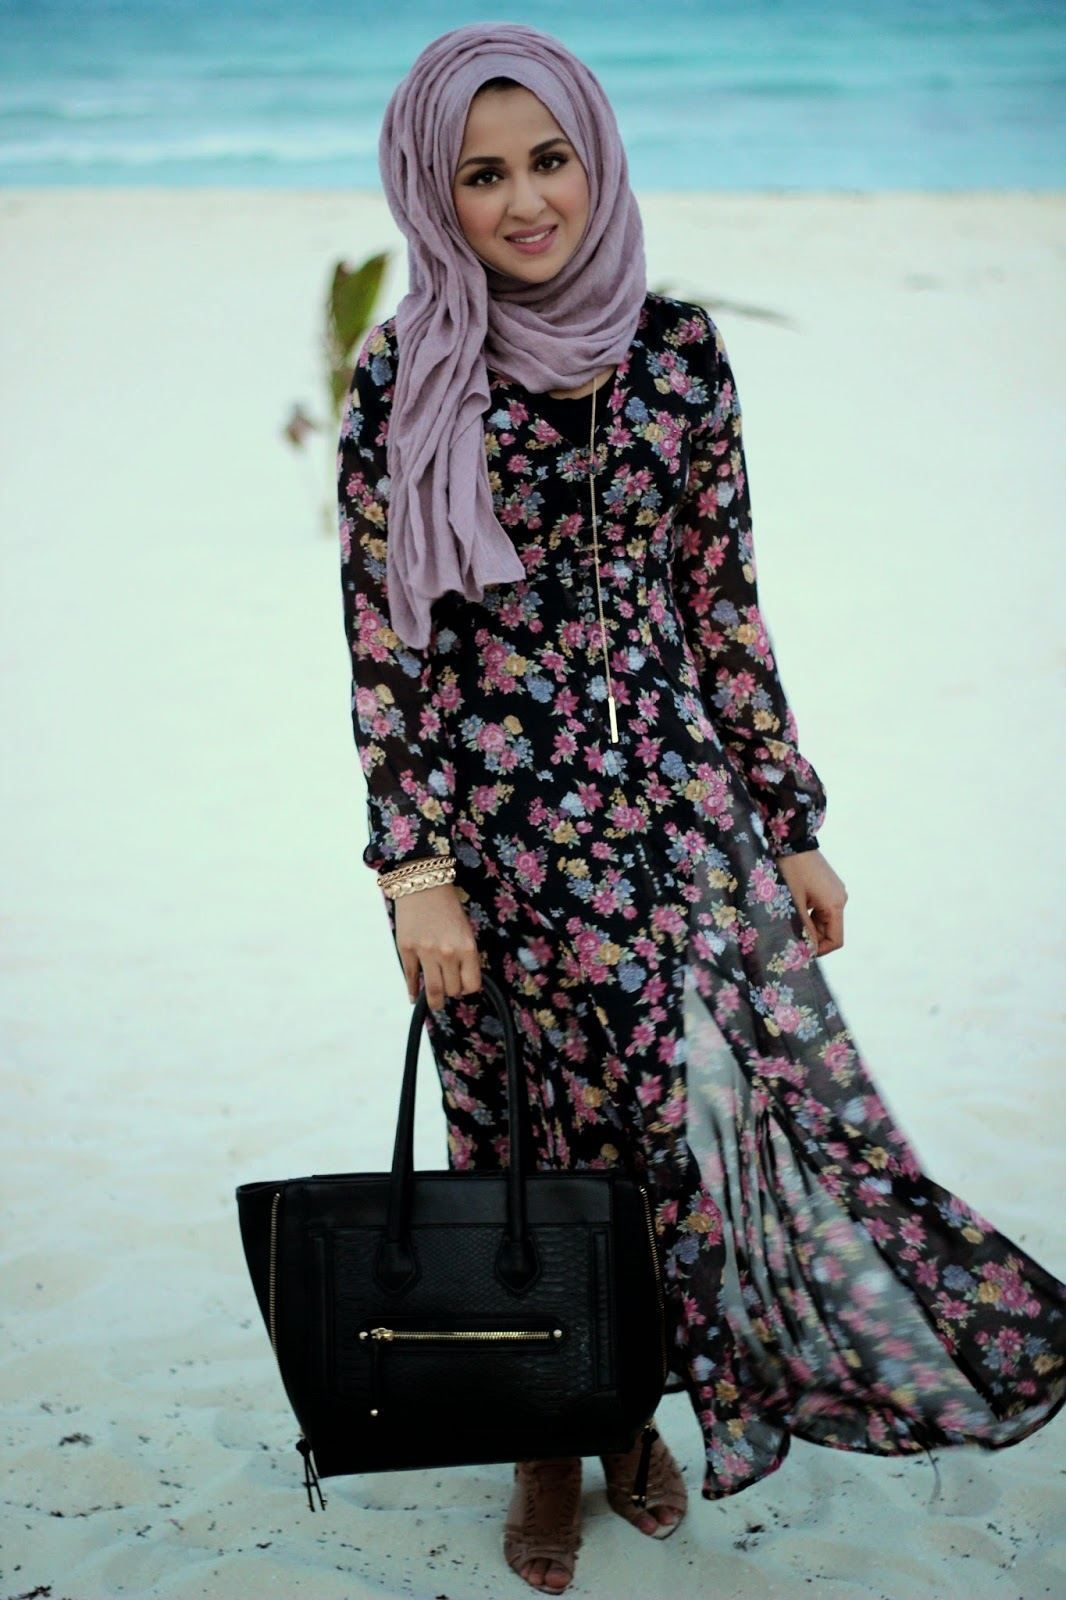 Beach Hijab Outfits–34 Modest Beach Dresses for Muslim Girls forecast